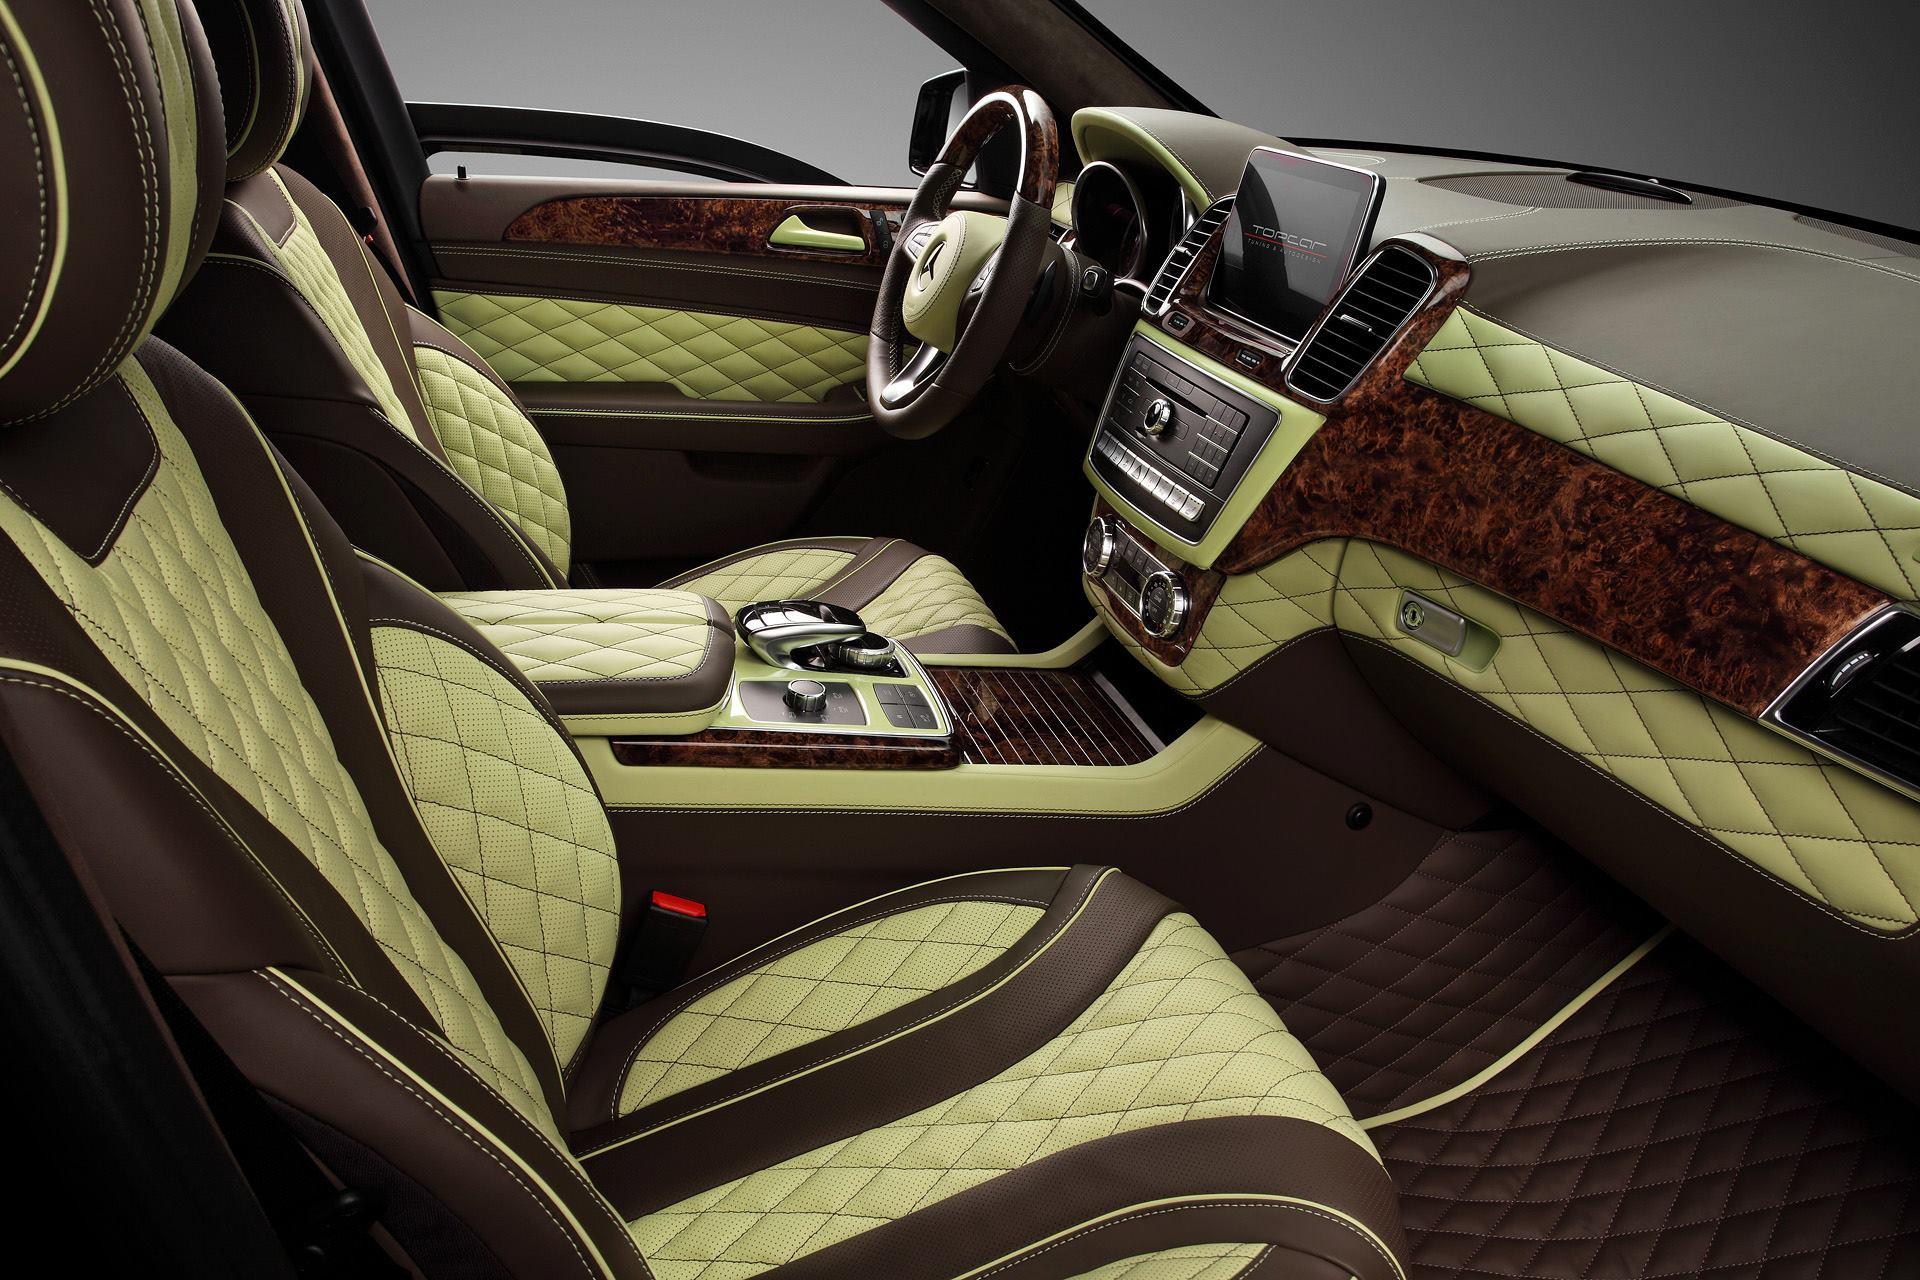 Armored Mercedes GLE Gets TopCar Inferno Custom Interior